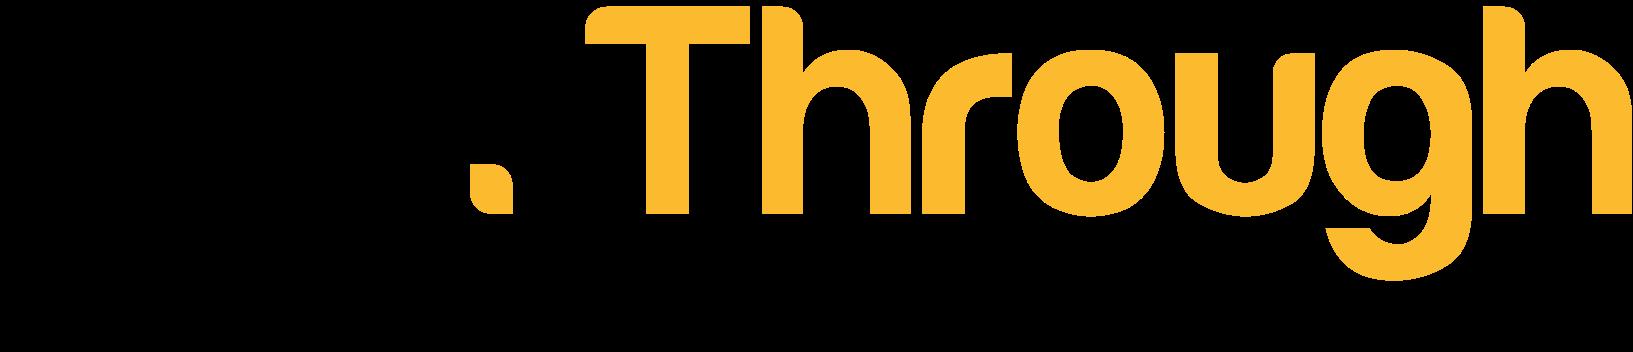 ClickThrough Marketing choose networx ATS